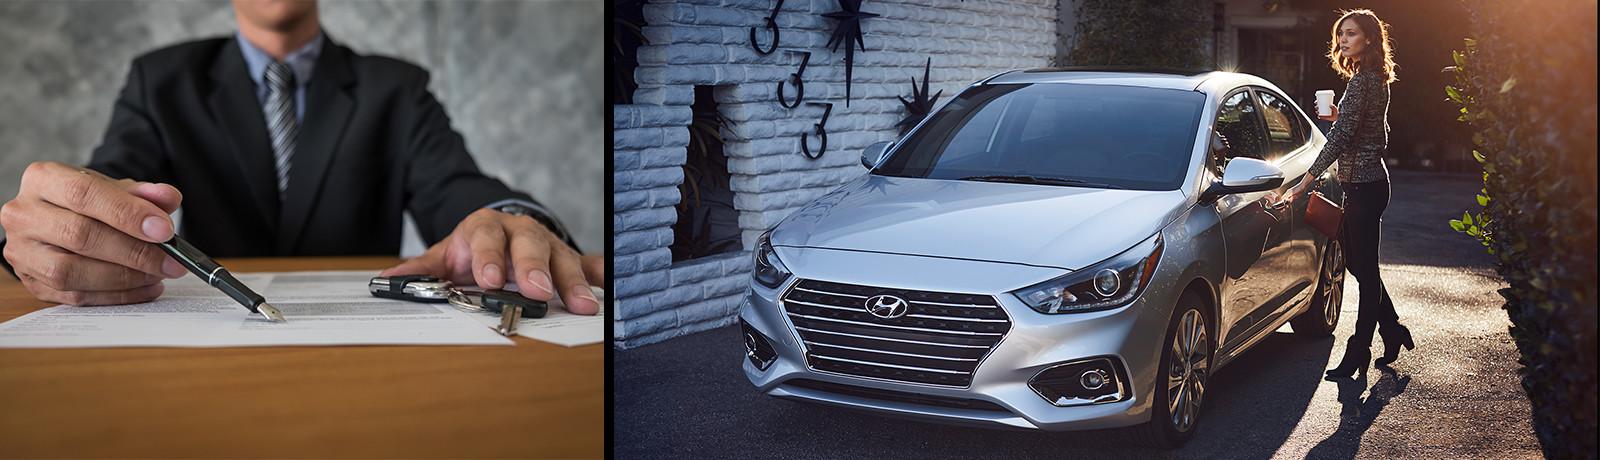 Buying a Hyundai